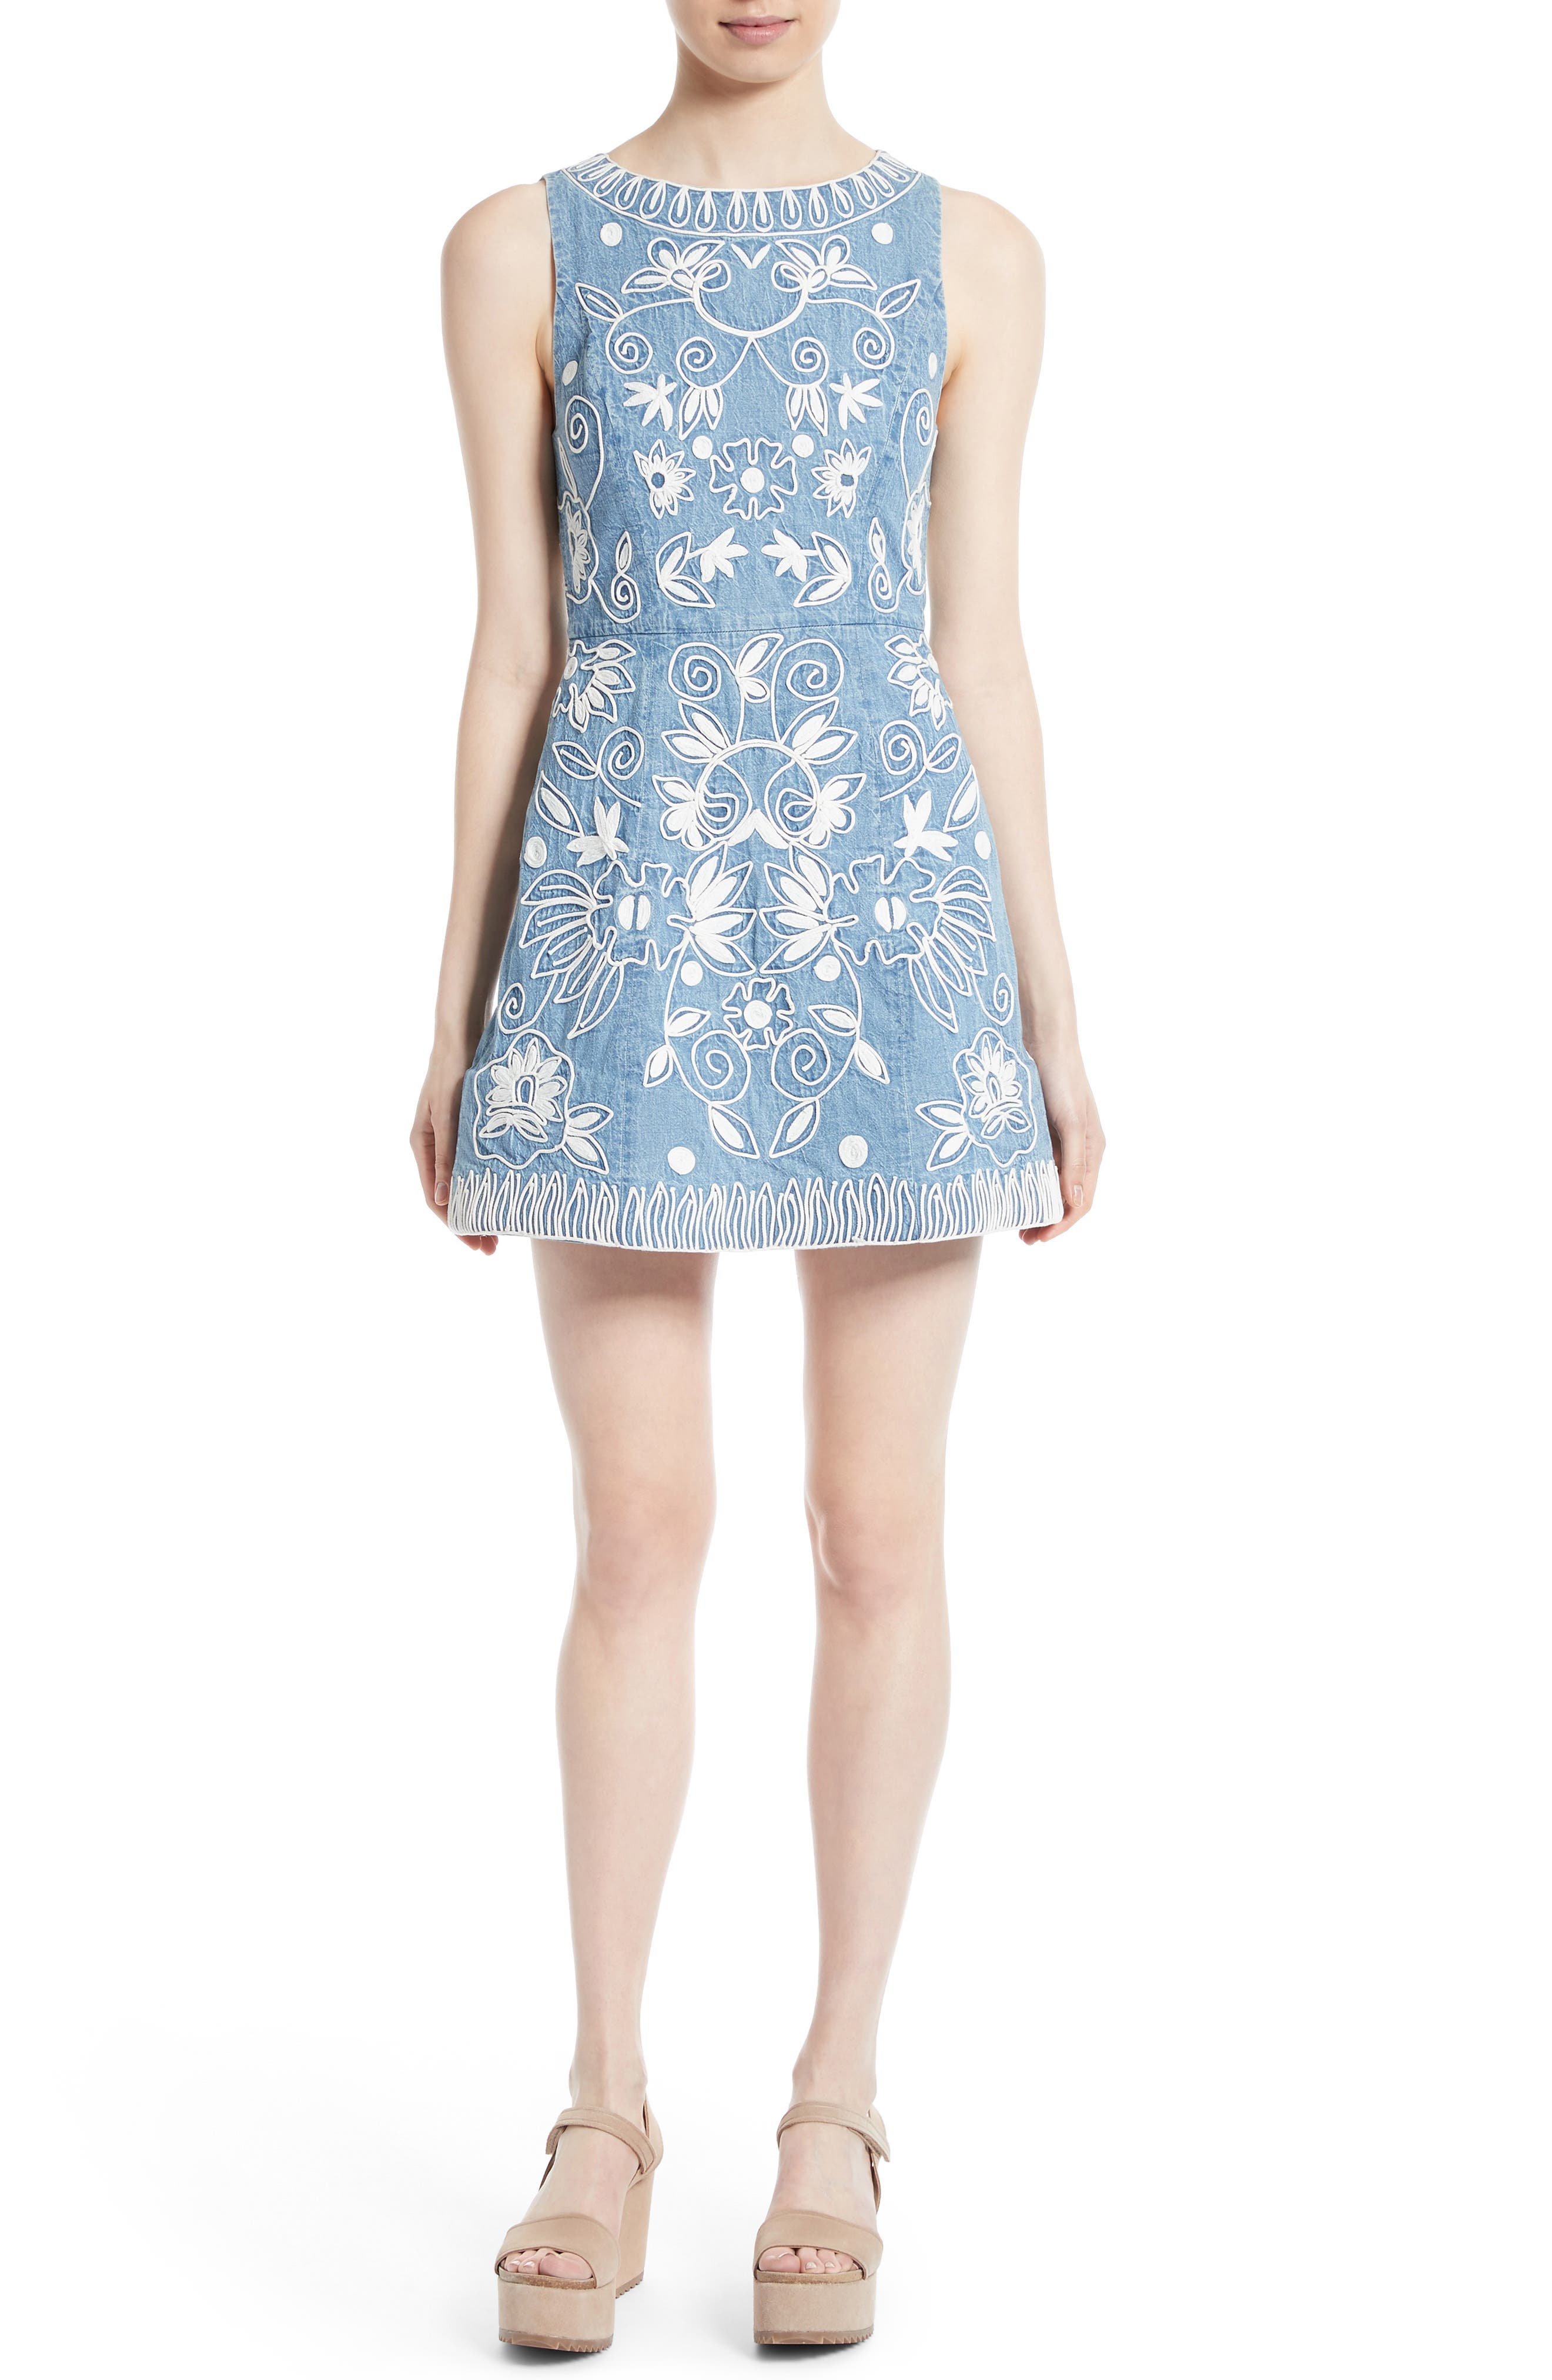 Alternate Image 1 Selected - Alice + Olivia Lindsey Embroidered A-Line Dress